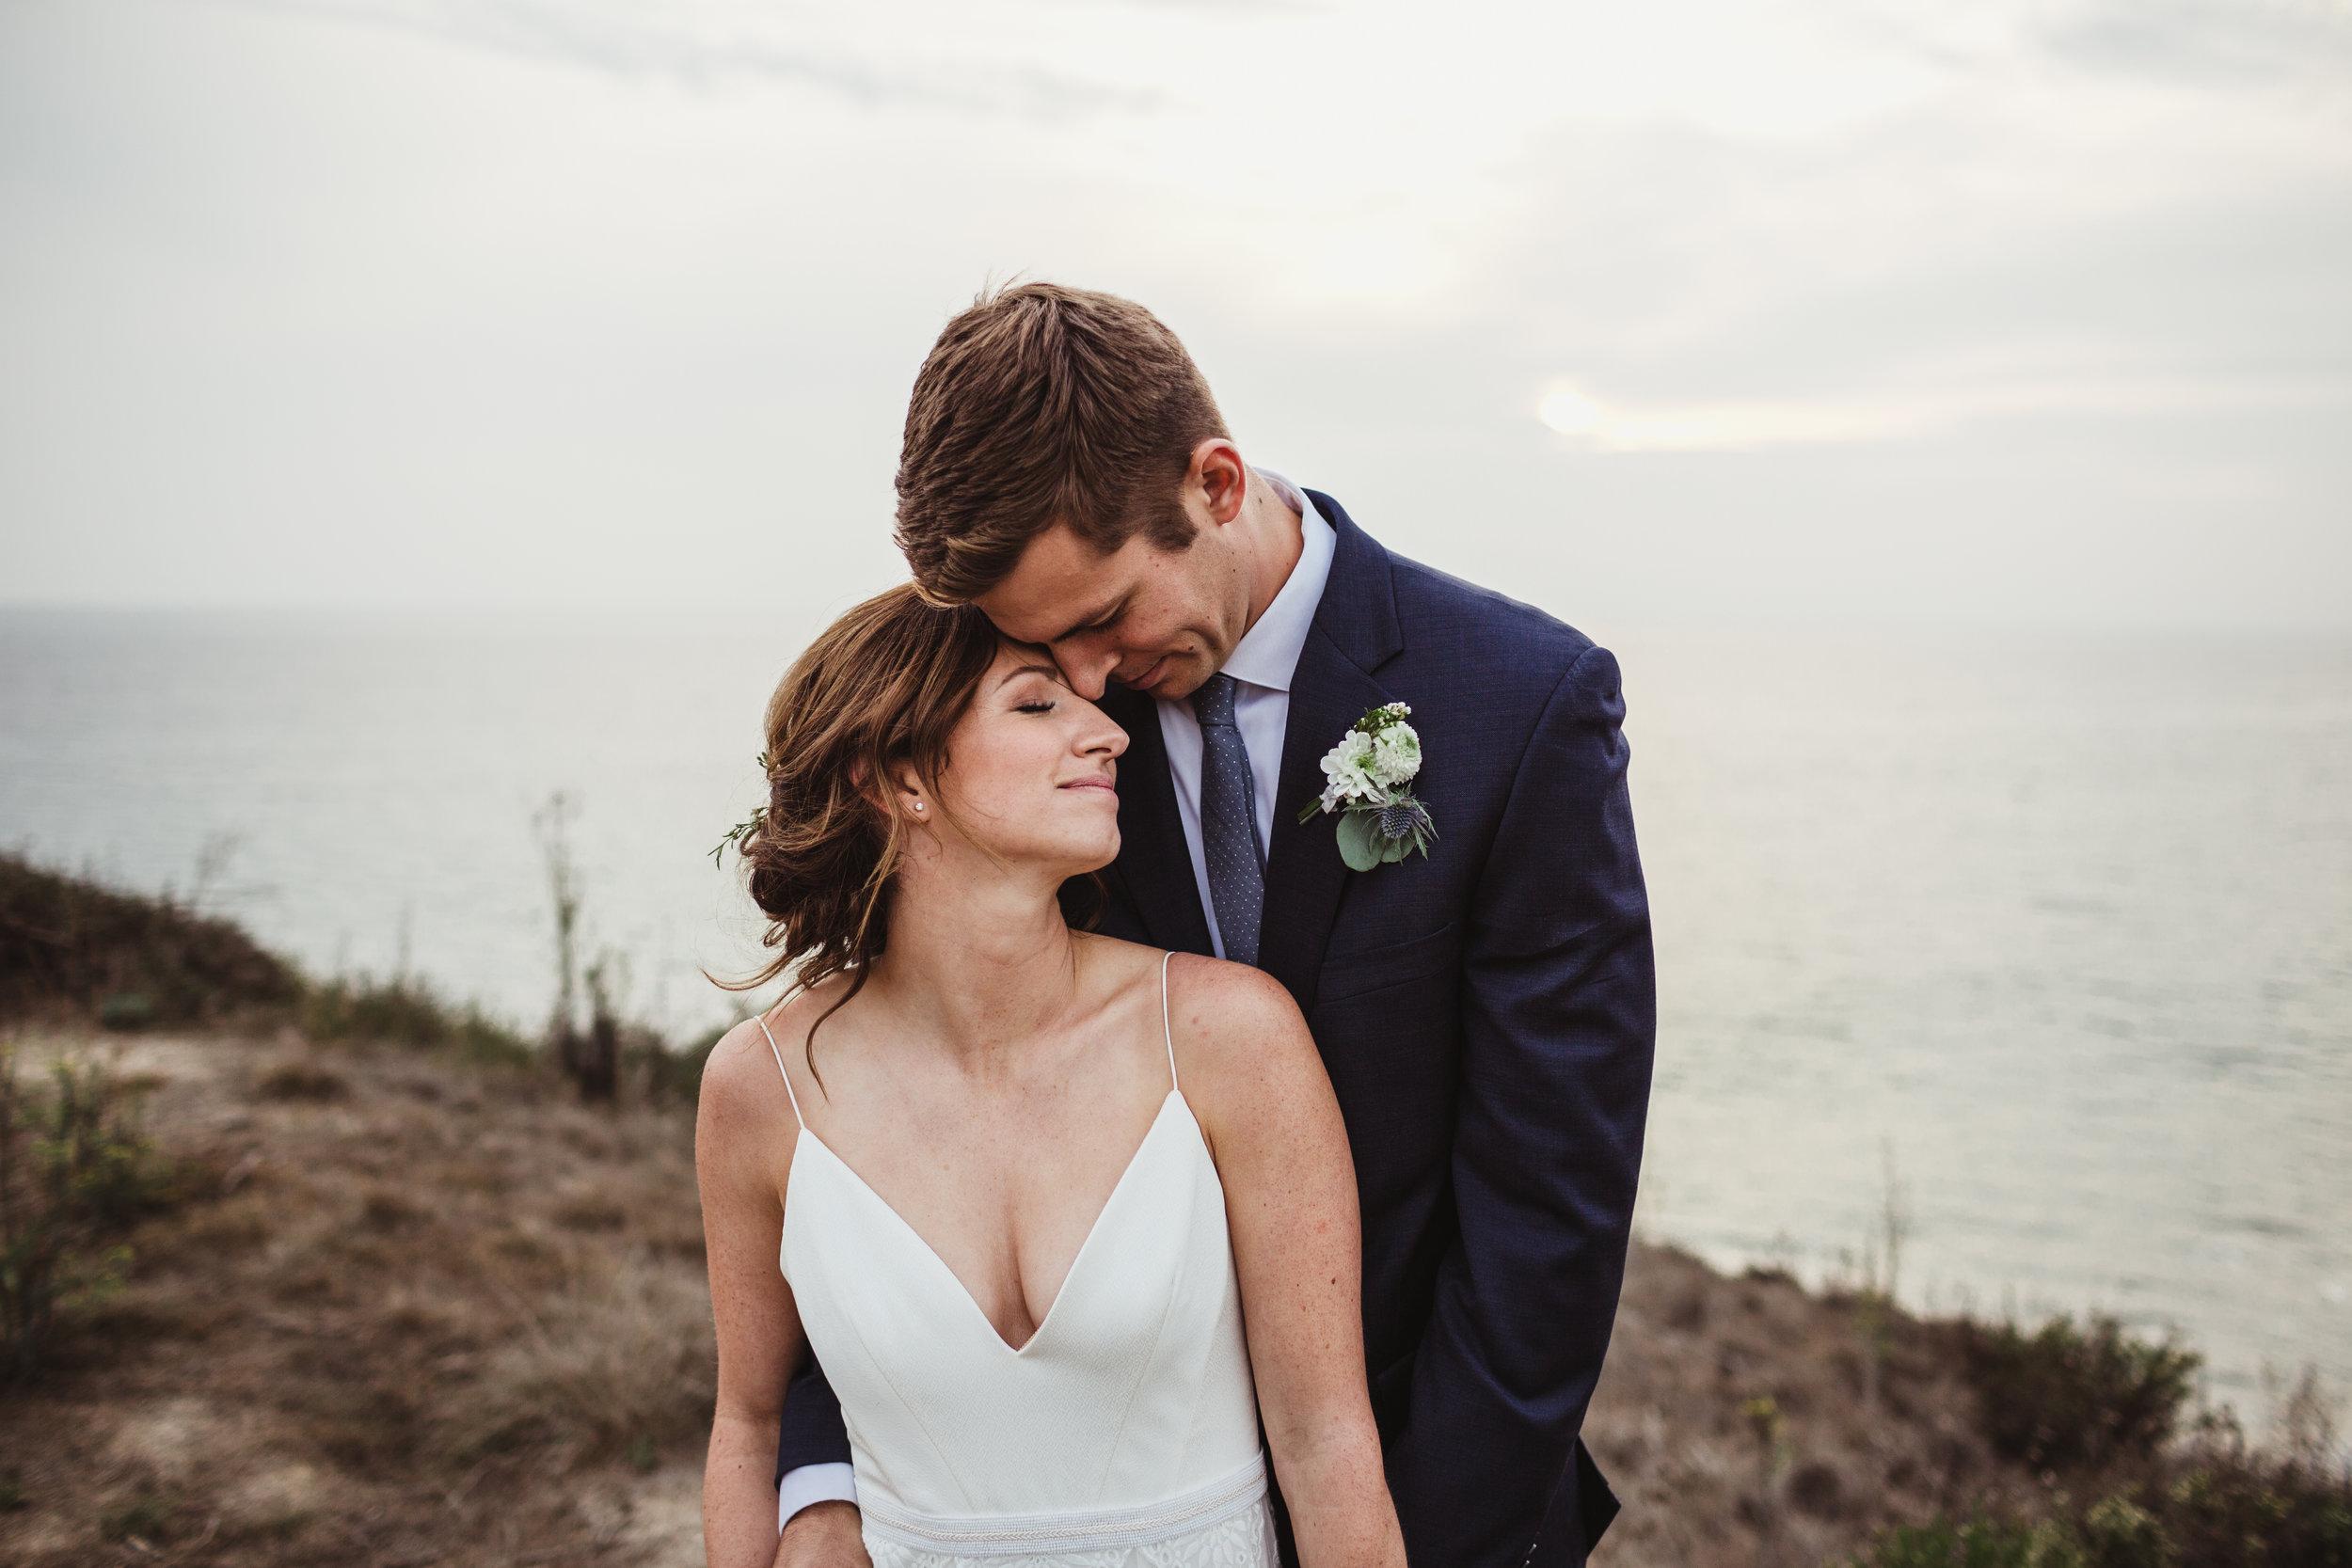 Jamie_English_Photography_JordanErik_Dos_Pueblos_Orchid_Wedding_Santa_Barbara_Fall2018-784.jpg